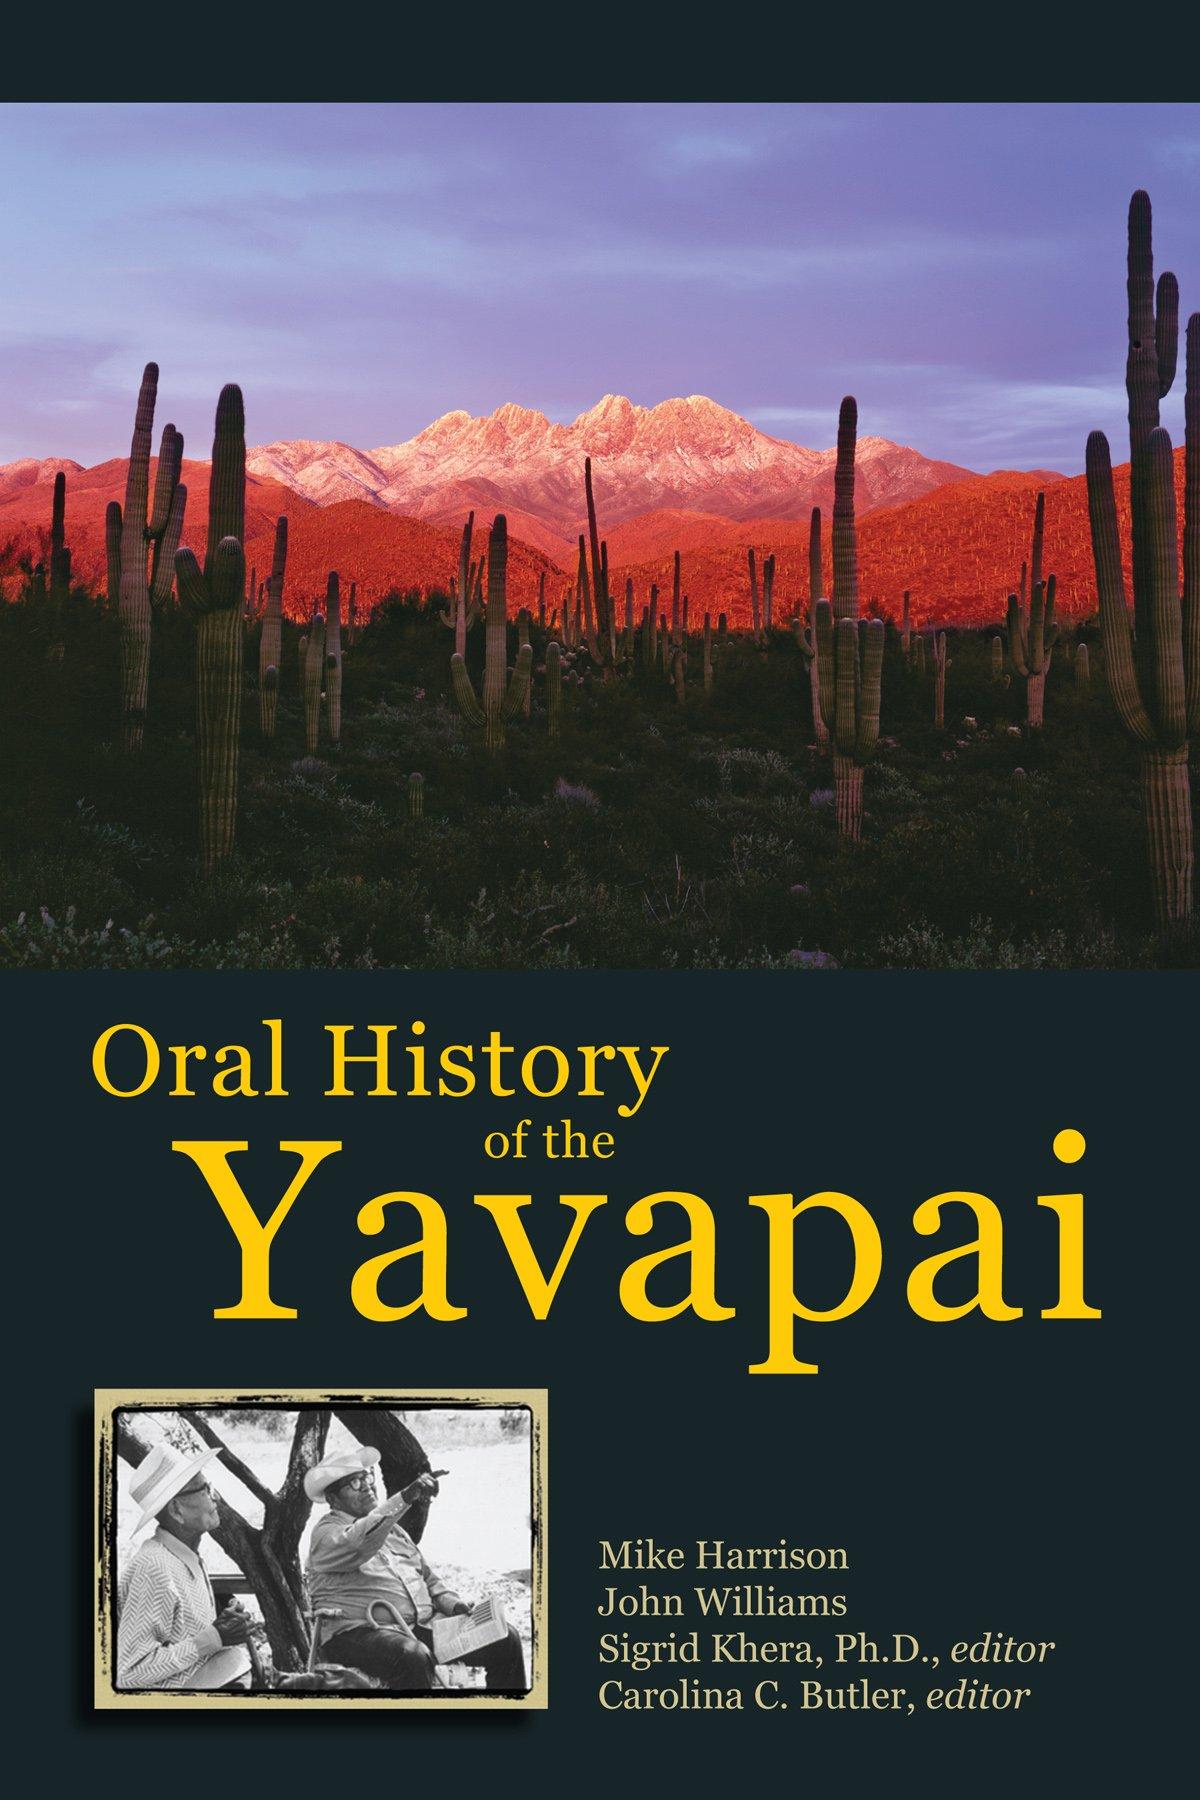 Oral History of the Yavapai pdf